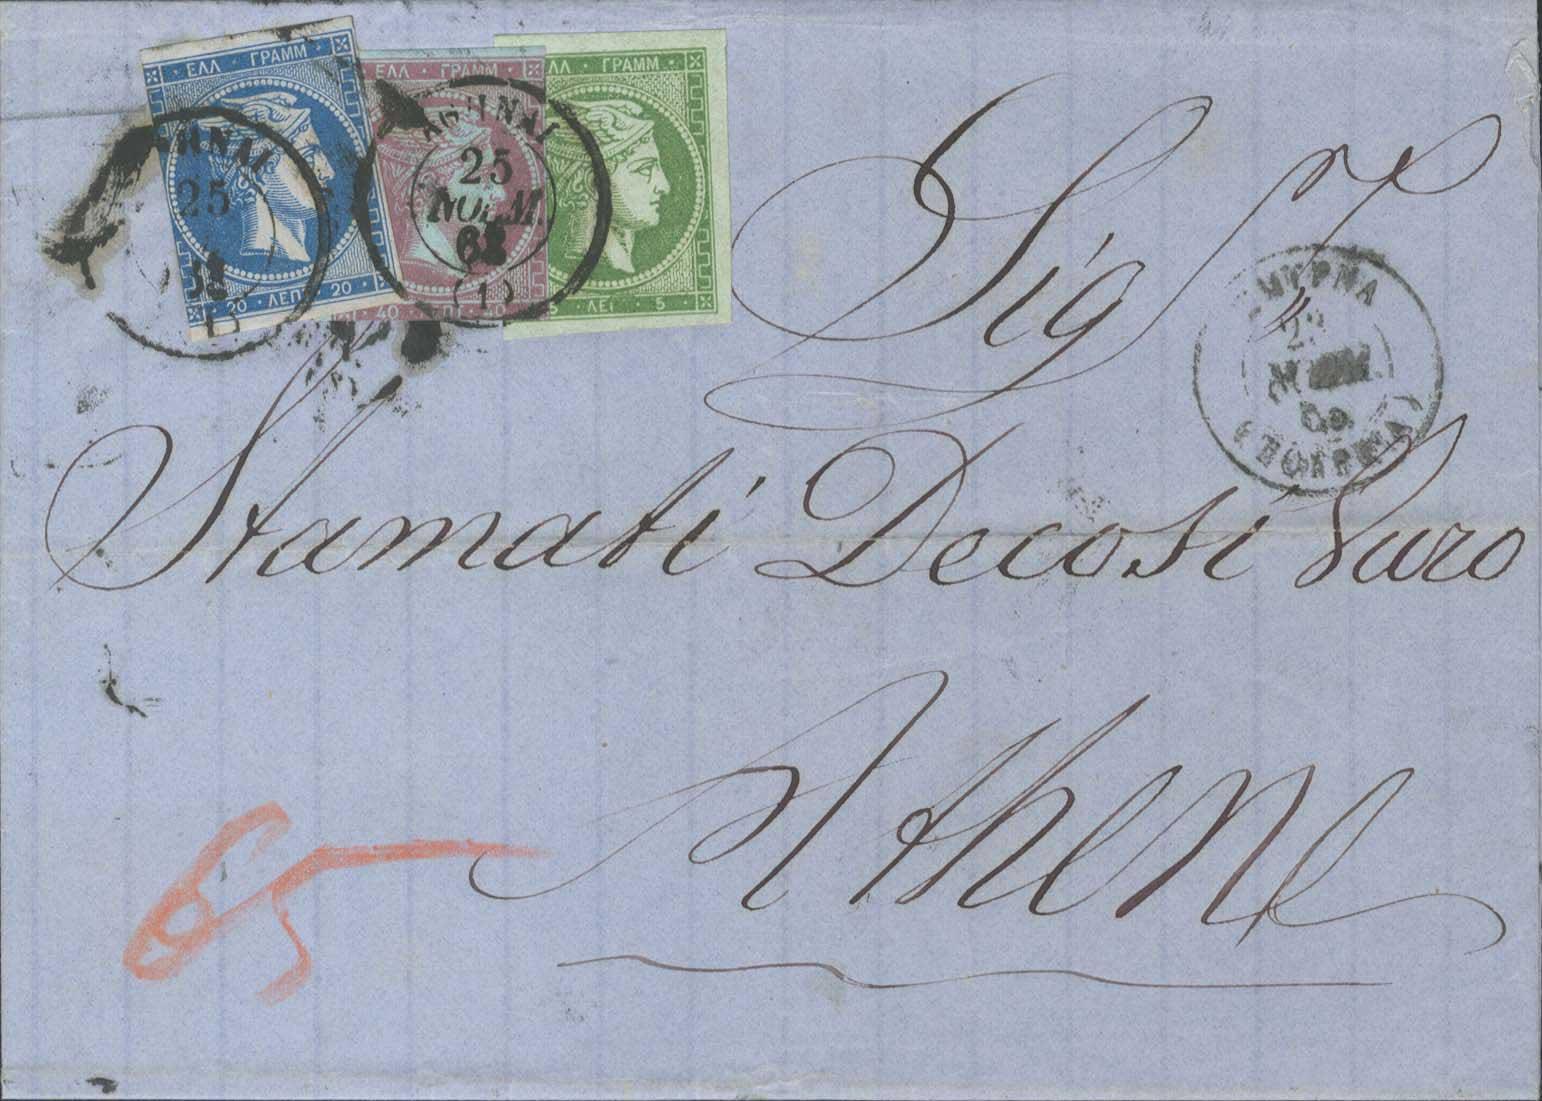 Lot 5153 - -  LARGE HERMES HEAD 1862/67 consecutive athens printings -  A. Karamitsos Public & Live Bid Auction 642 (Part A)